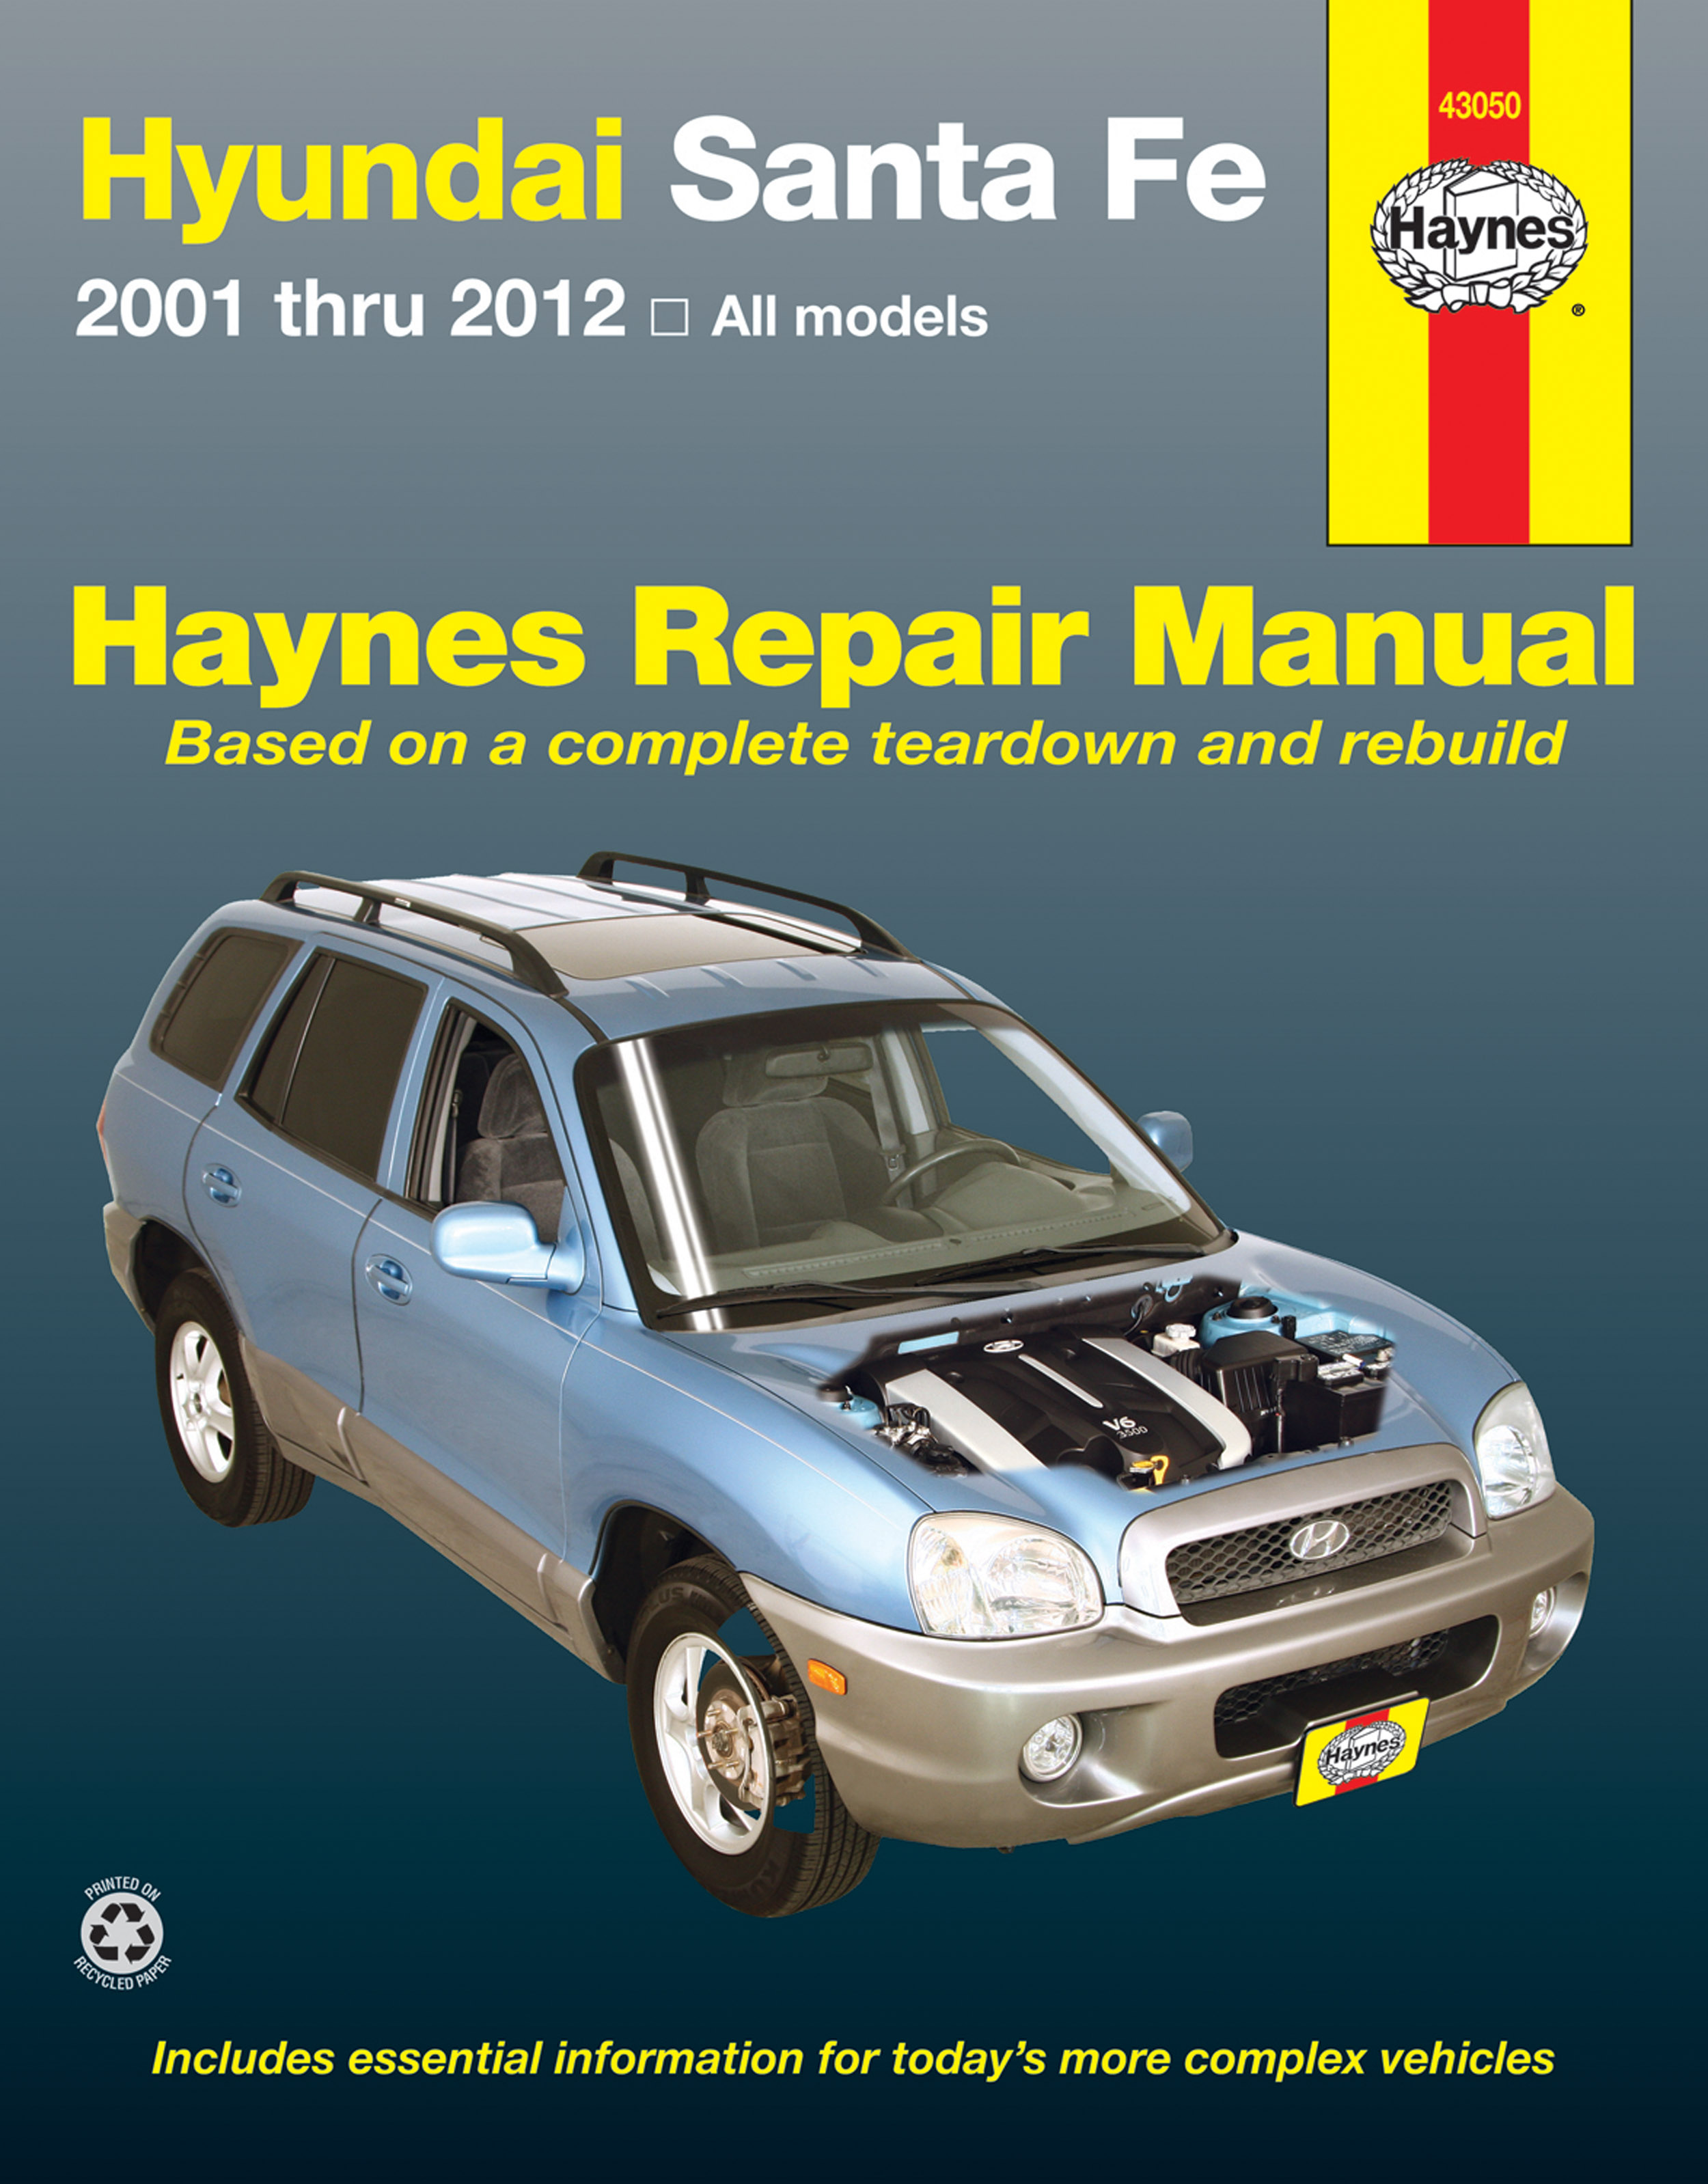 Hyundai Sante Fe (01-12) Haynes Repair Manual